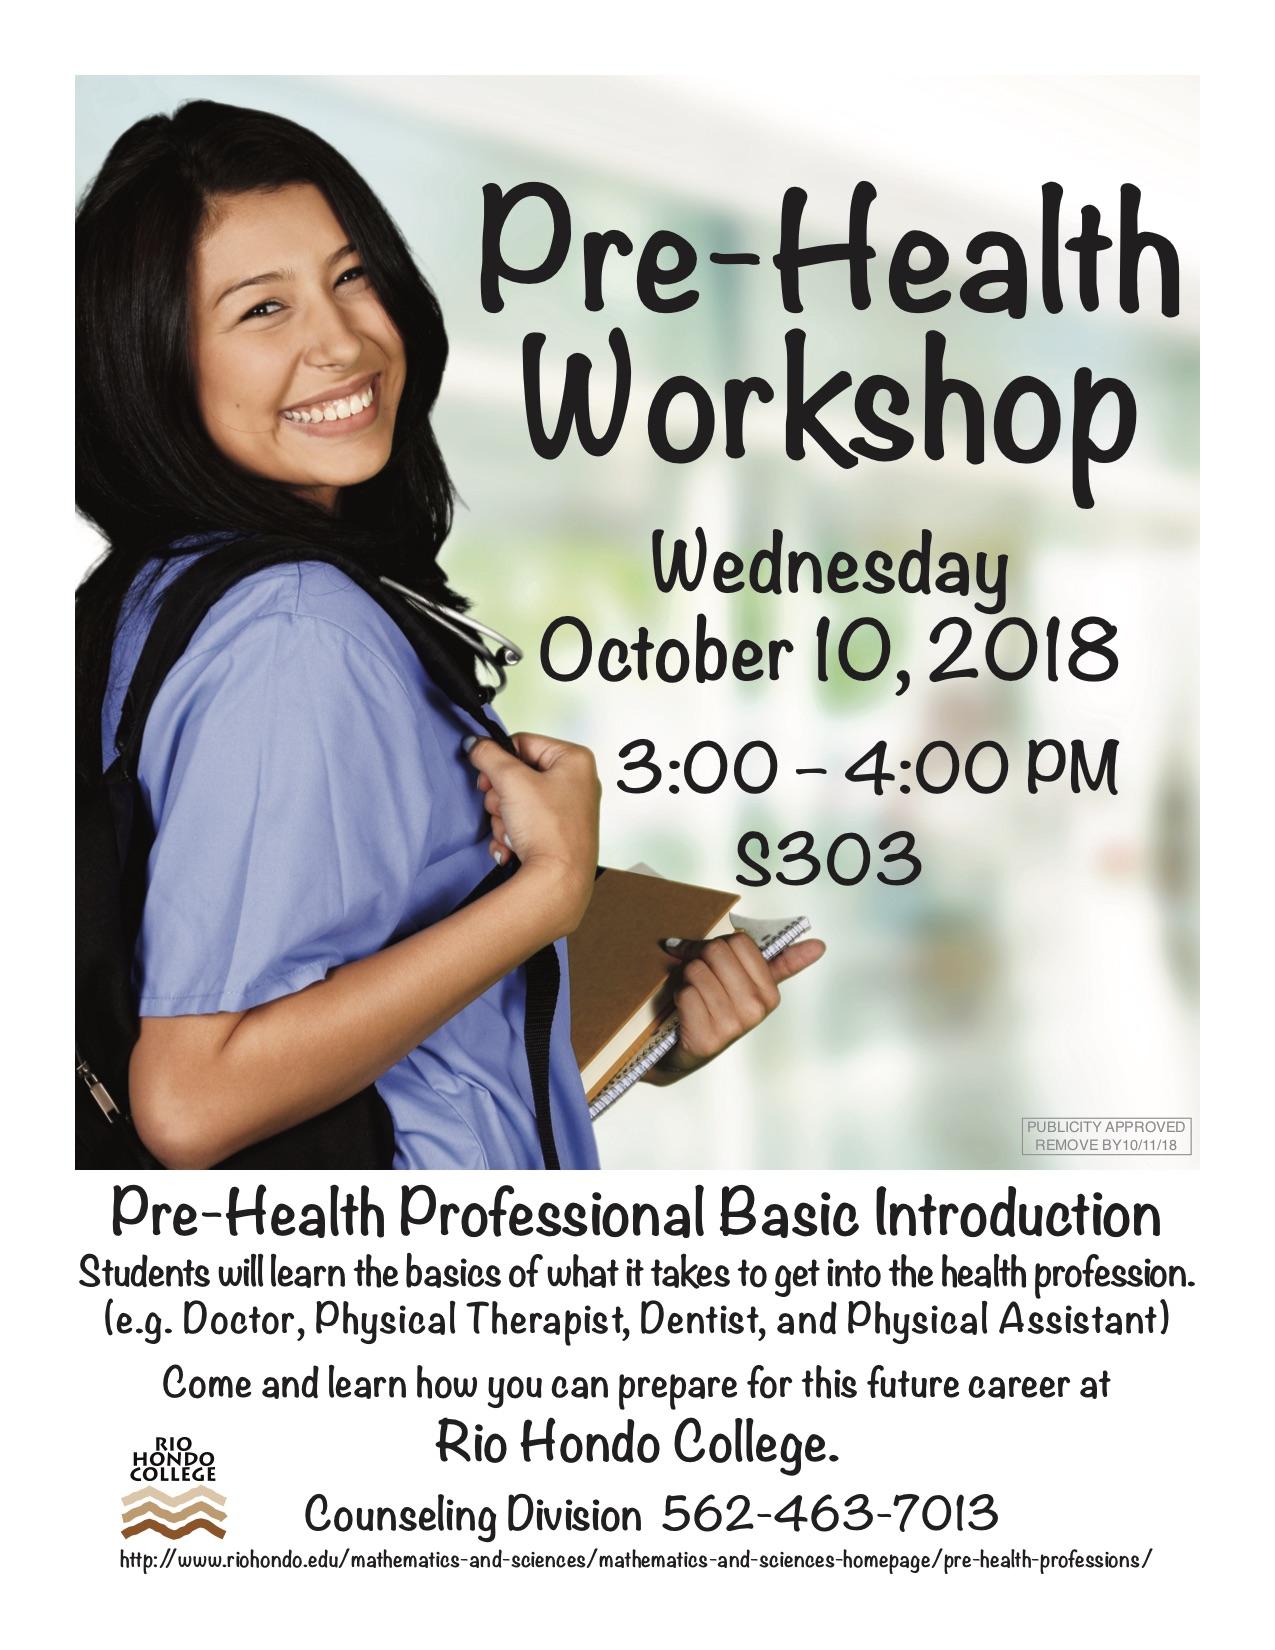 Pre-Health Professions | Mathematics and Sciences